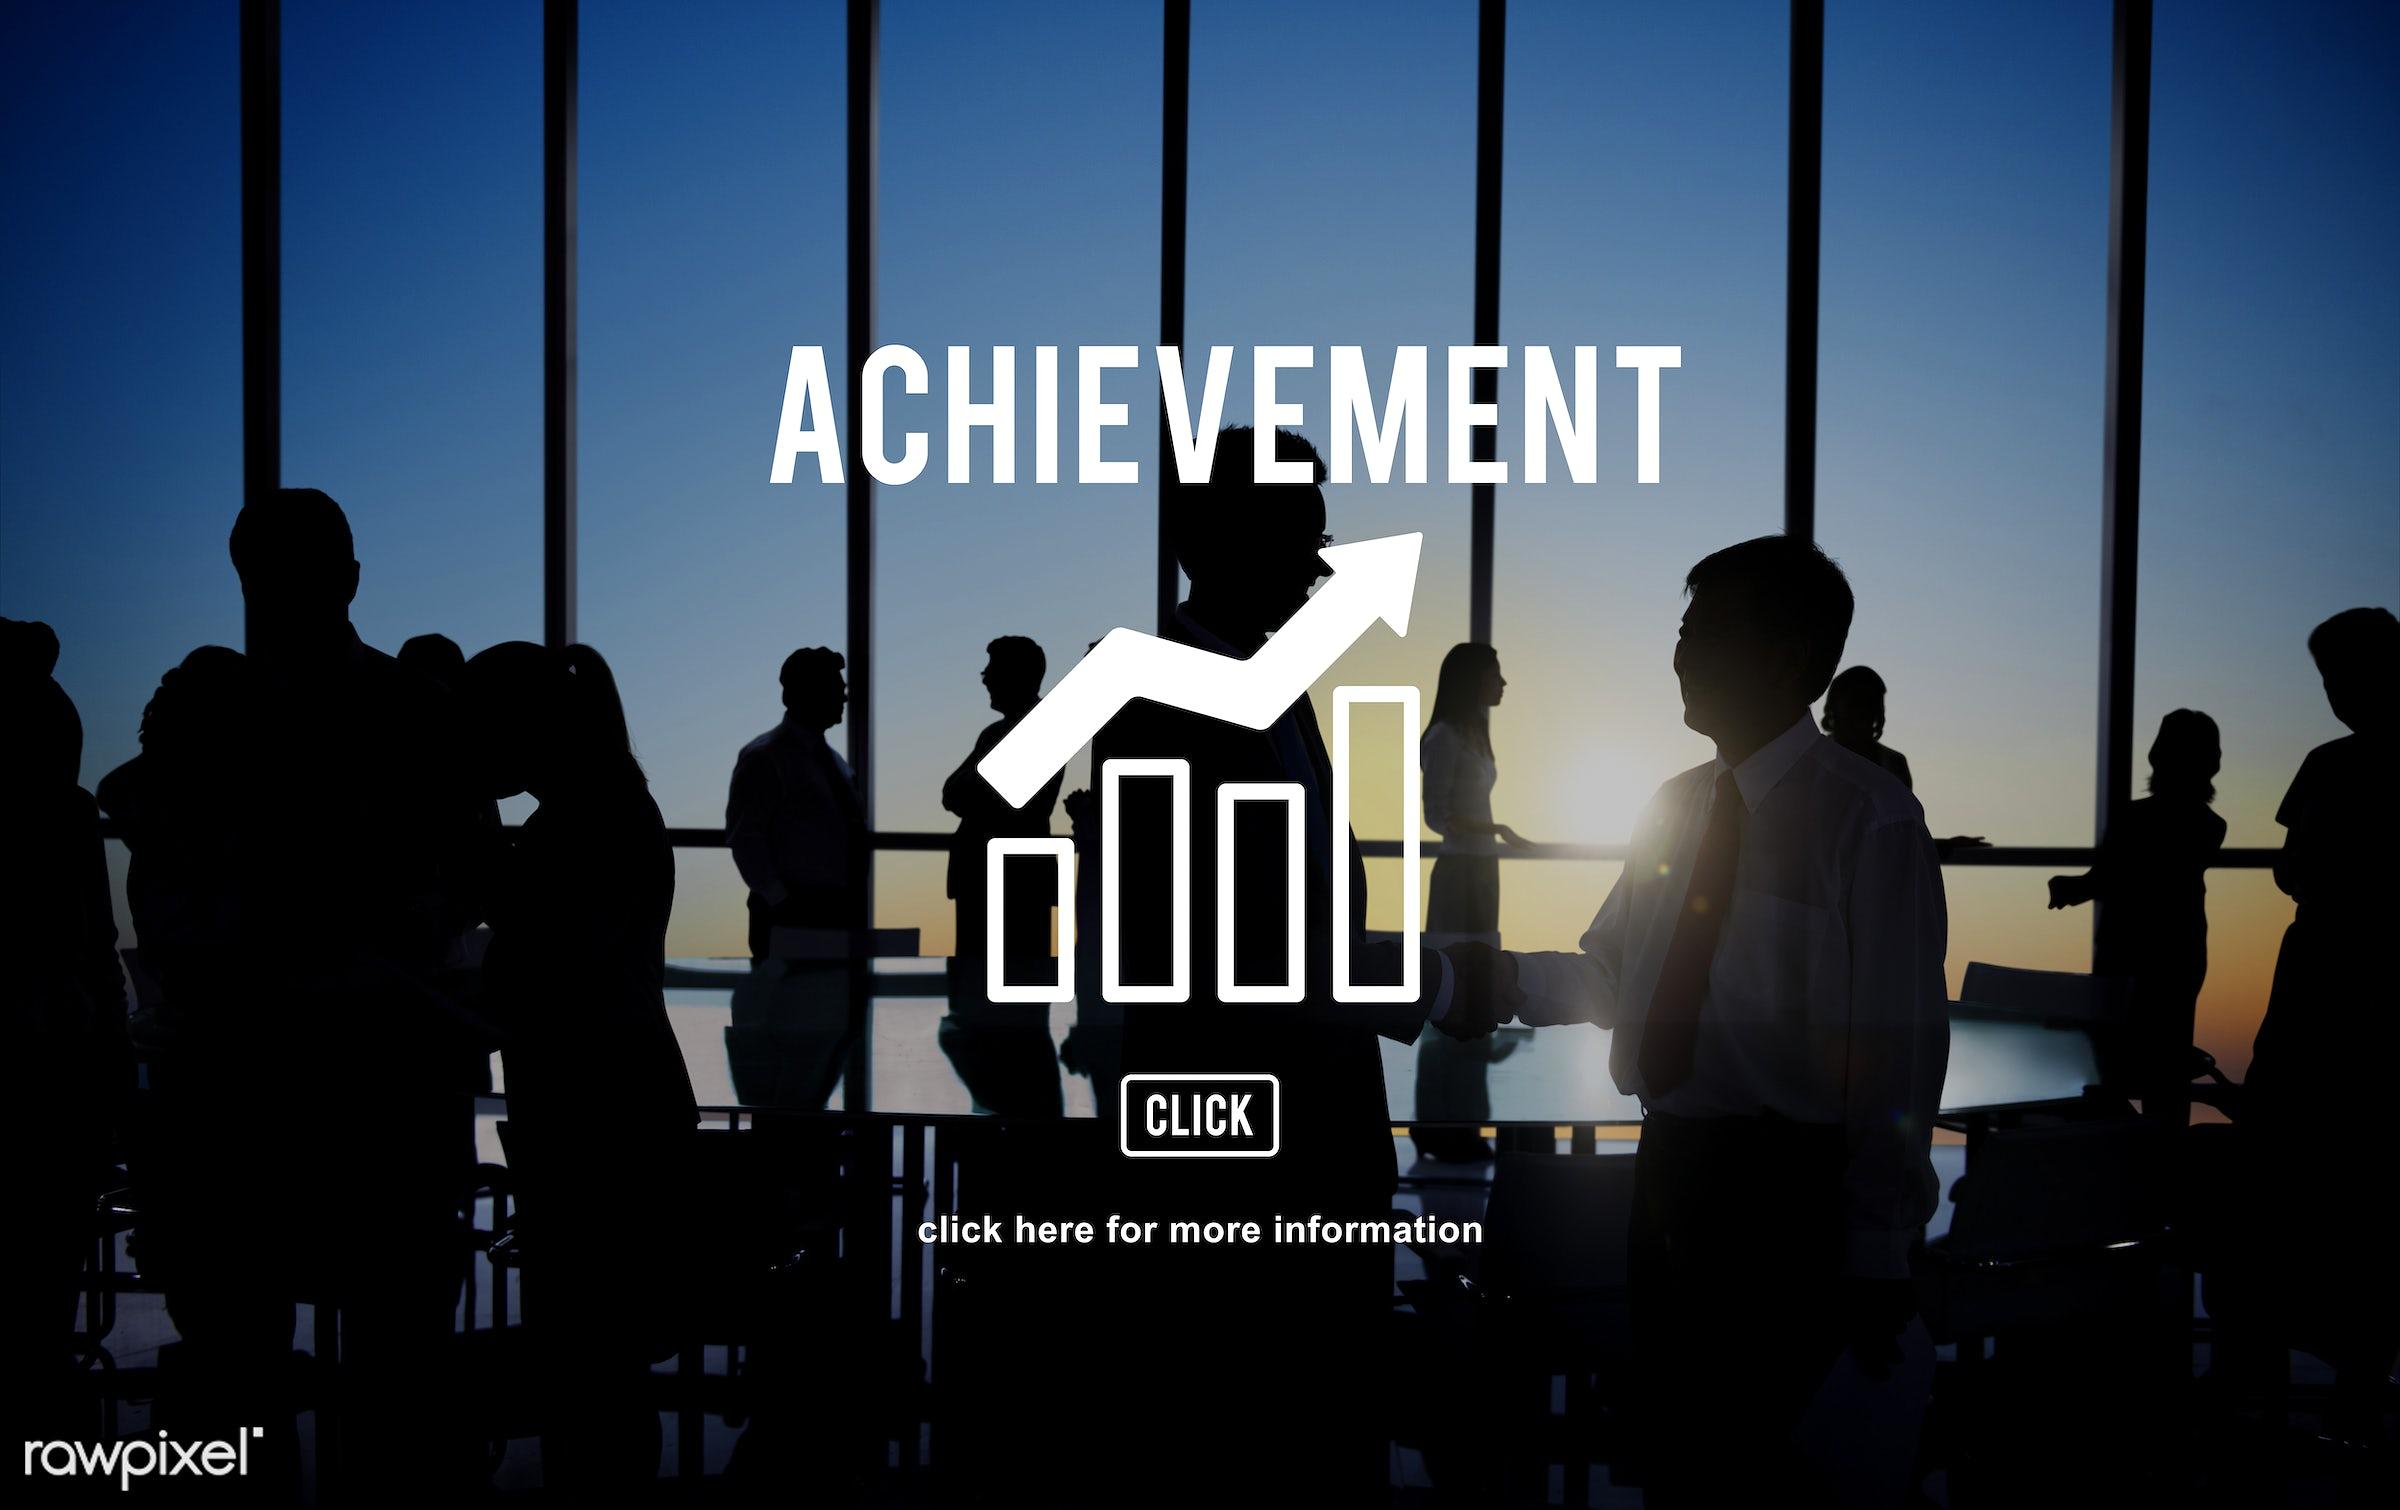 achievement, aim, backlit, business, business people, businessmen, businesswomen, chart, colleague, communication, corporate...